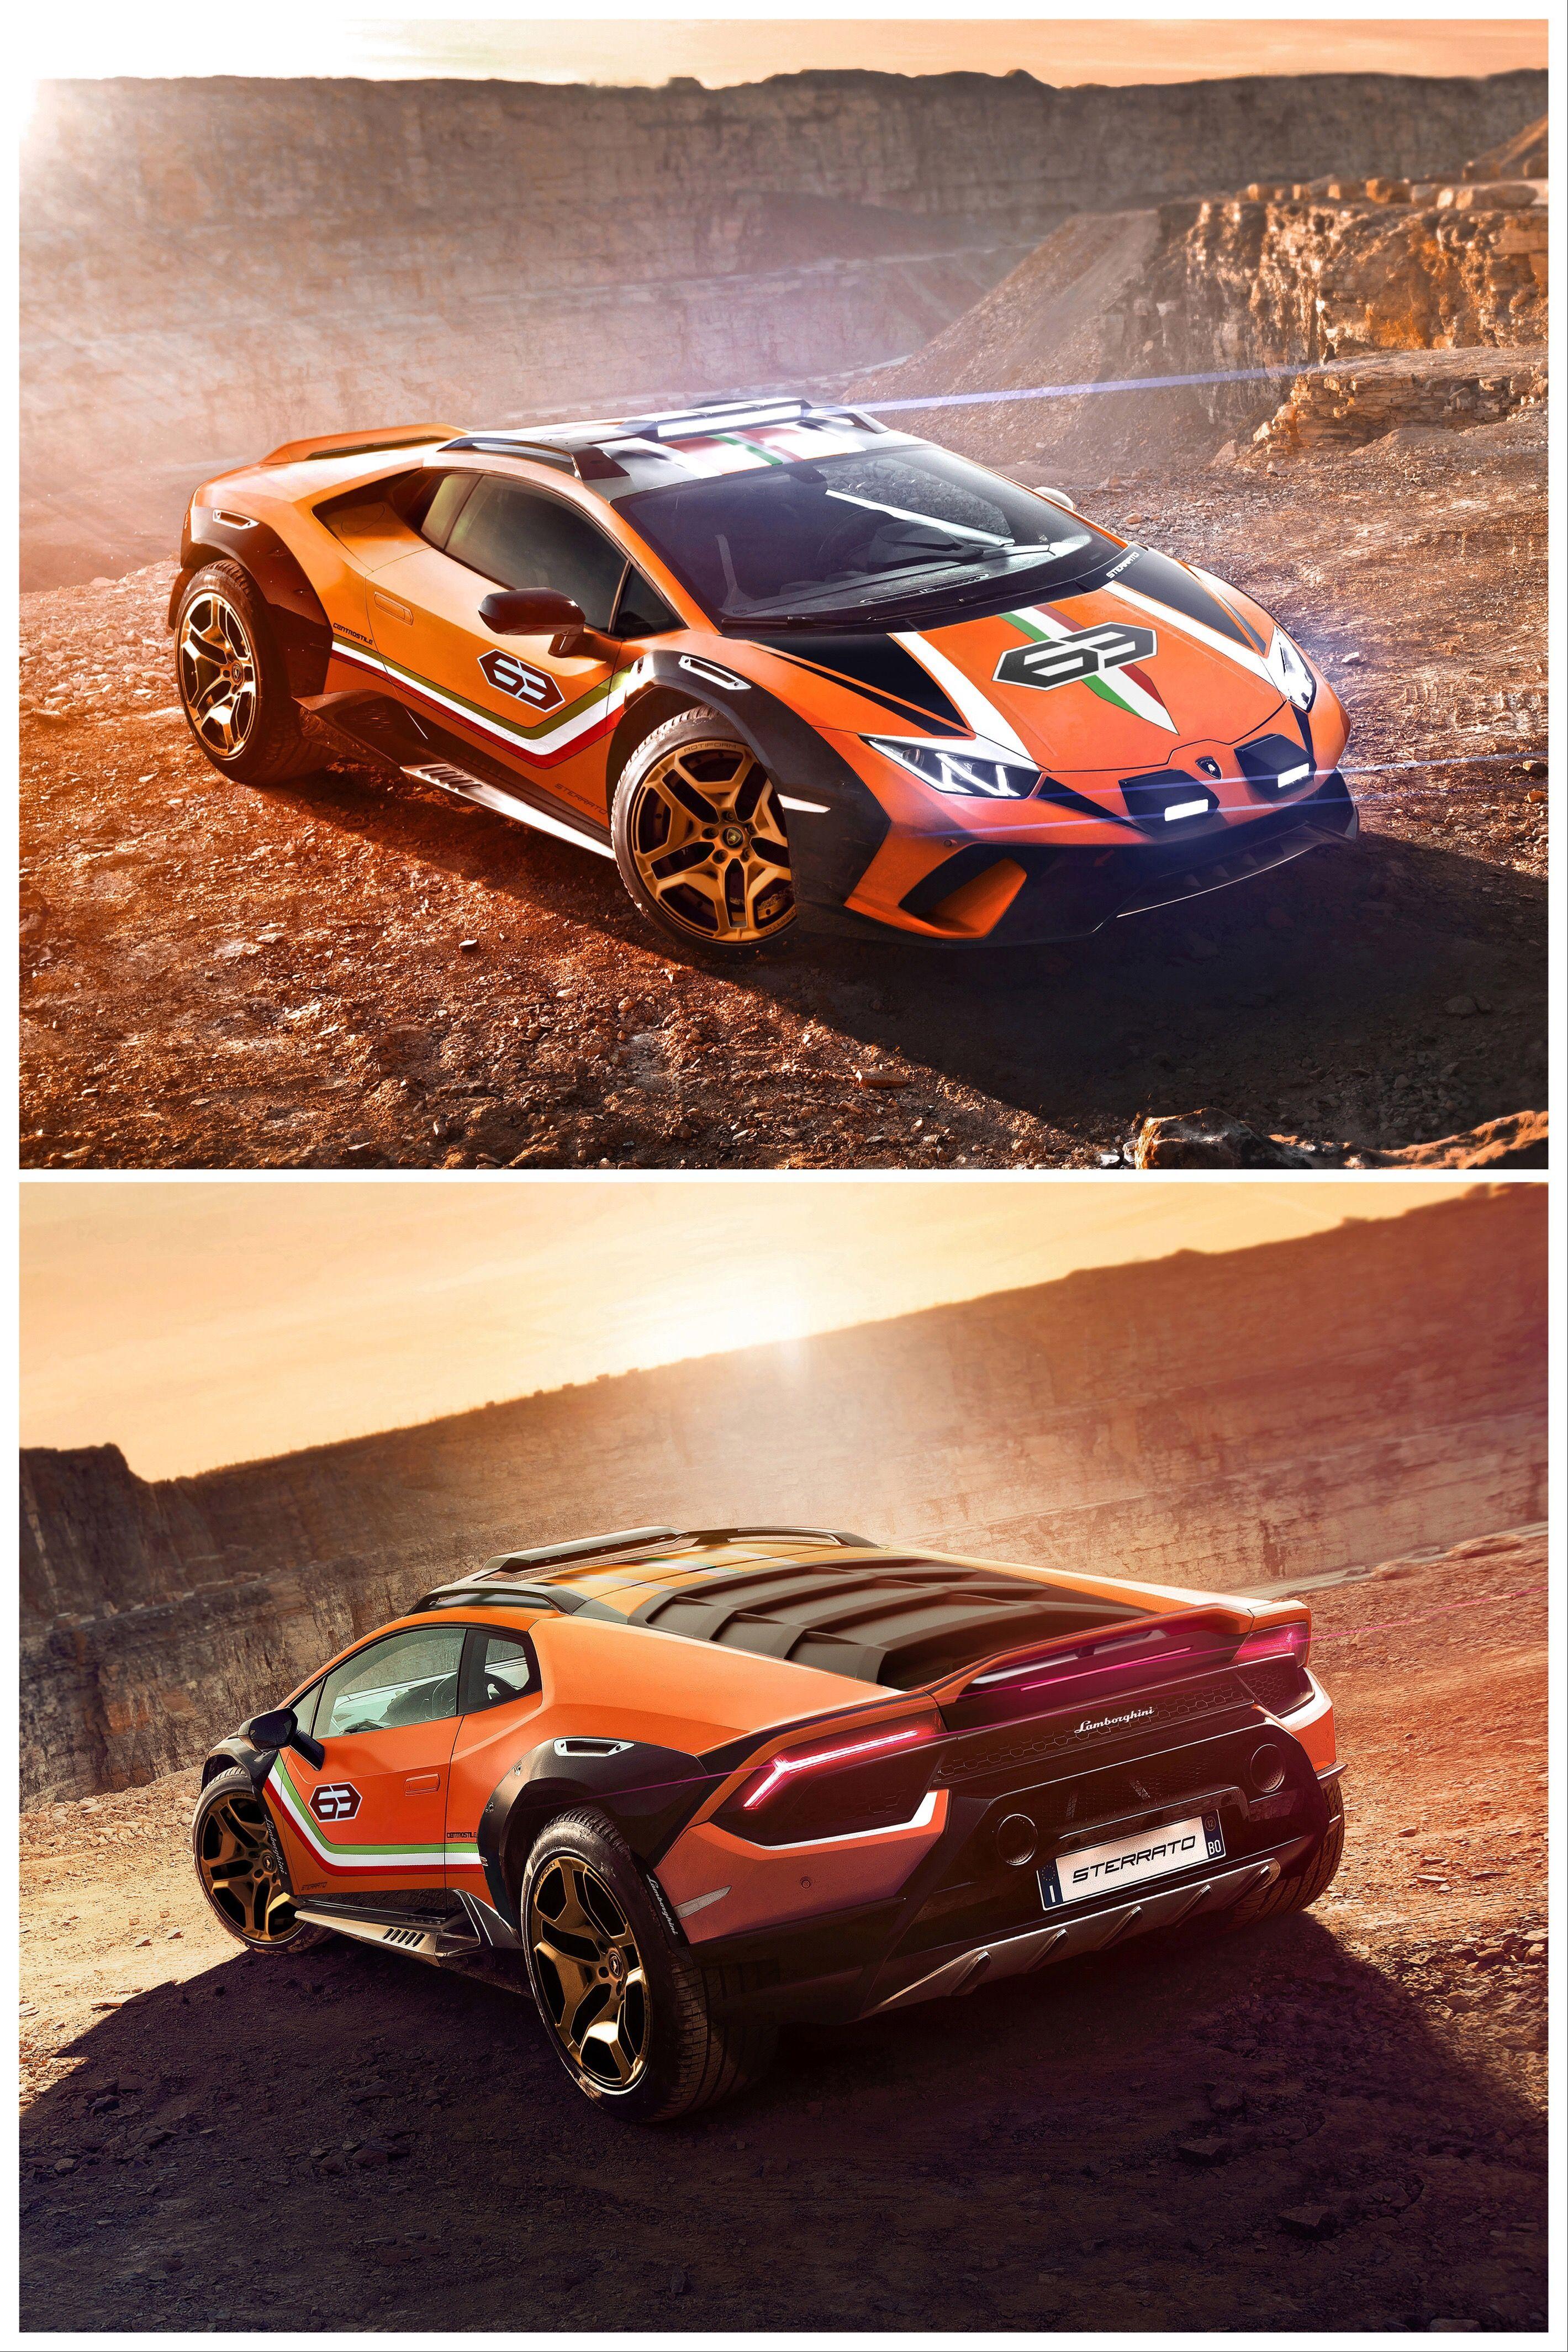 The Lamborghini Huracan Sterrato Is An Off Road Supercar Super Cars Lamborghini Lamborghini Huracan